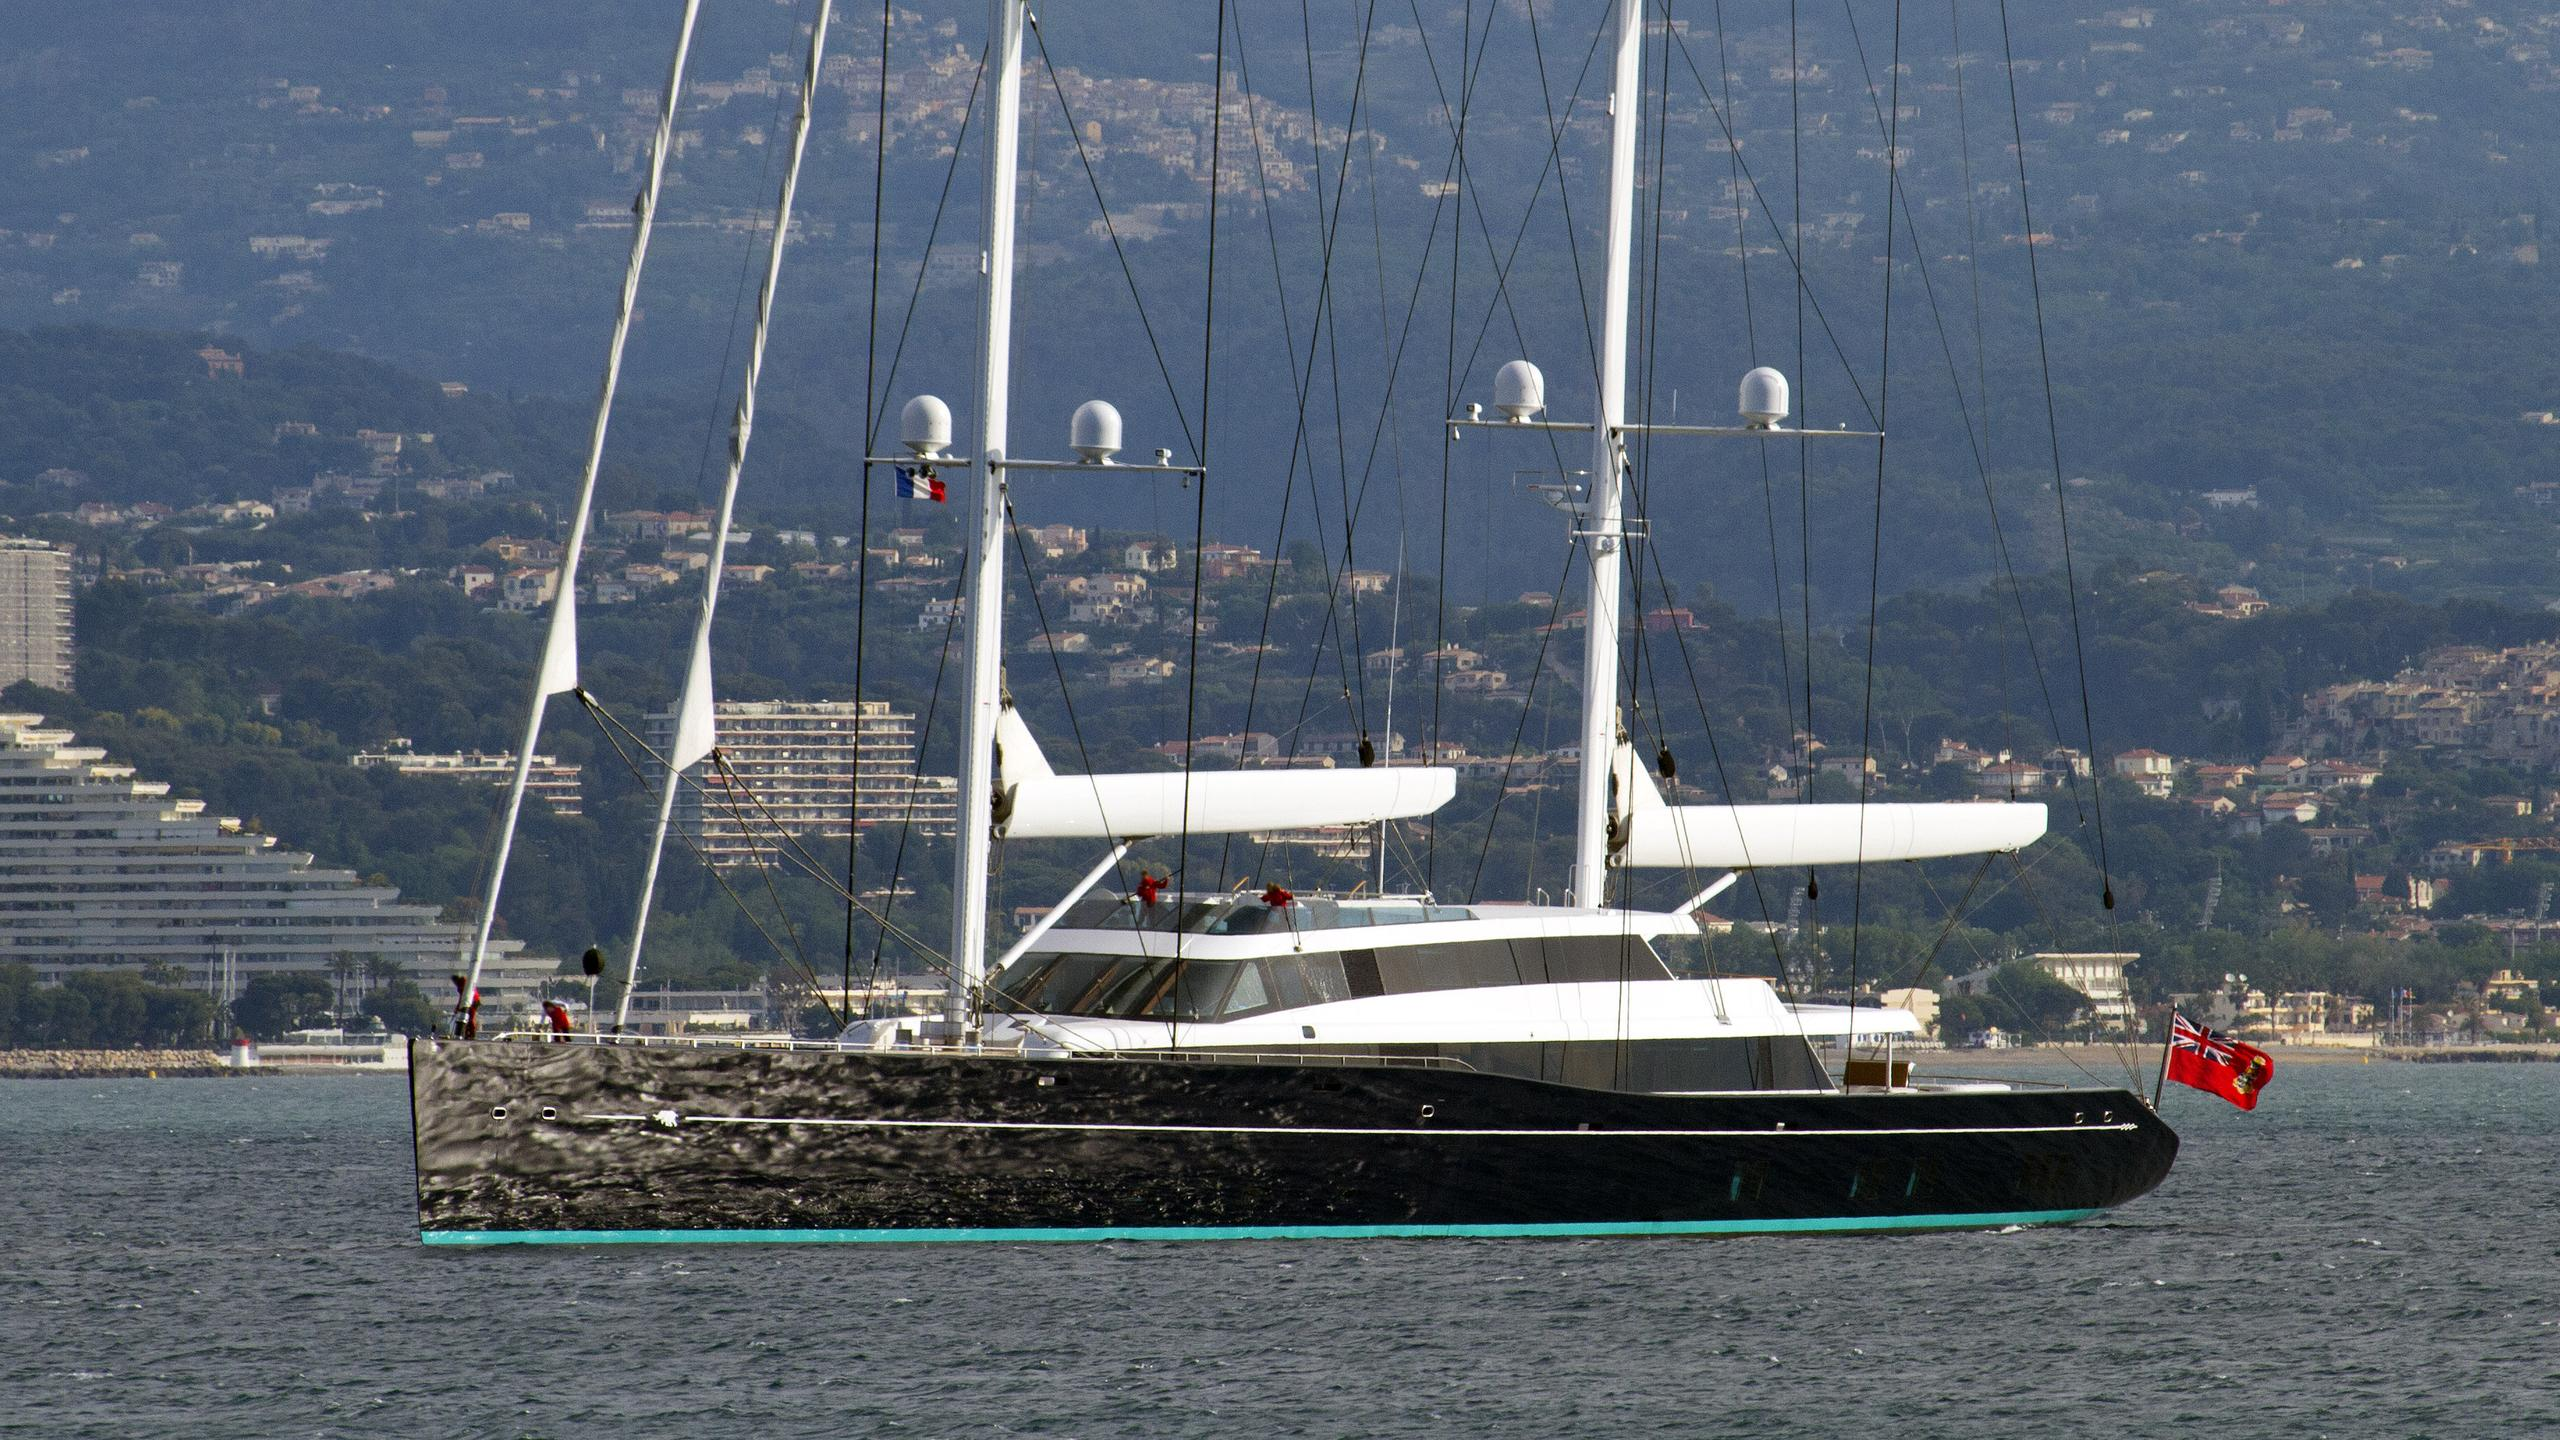 aquijo-sailing-yacht-vitters-oceanco-2015-86m-half-profile